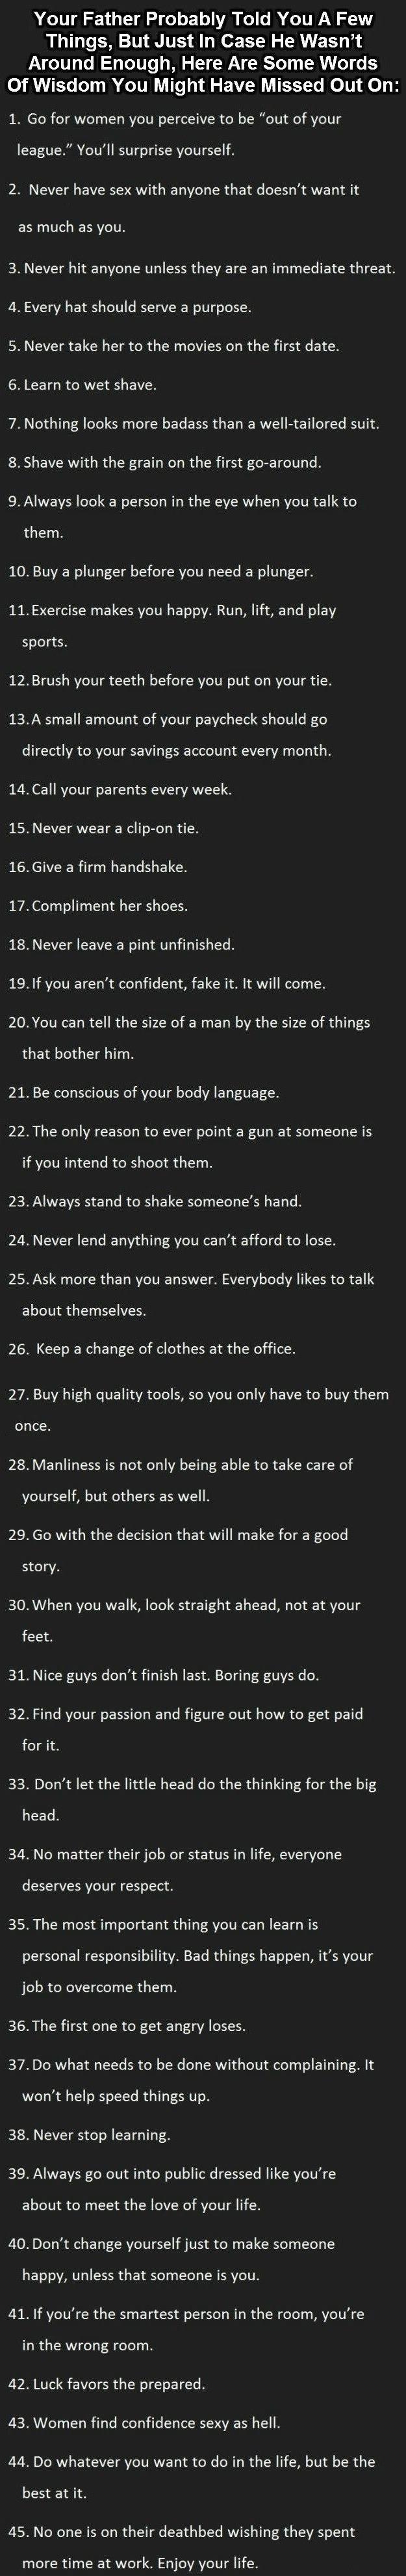 Ultimate tips for men